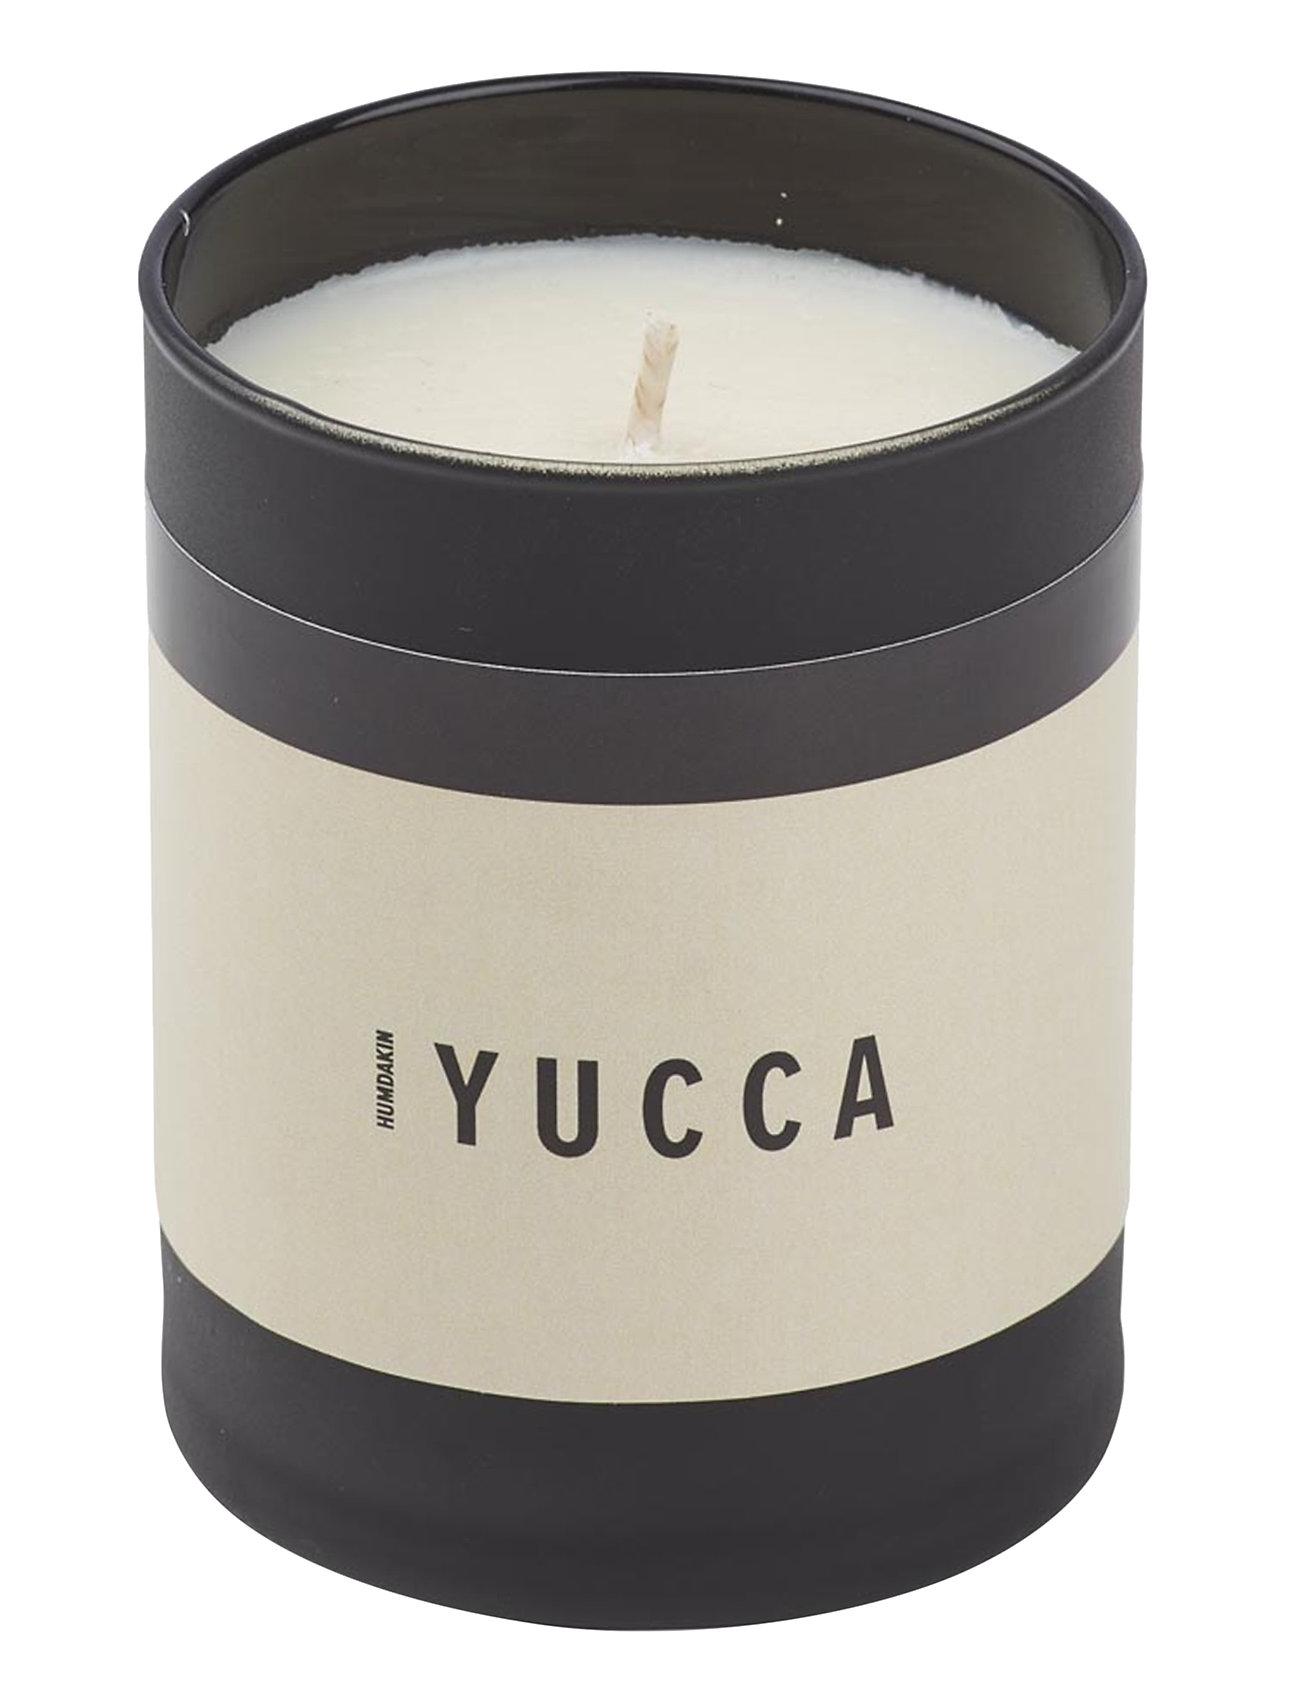 Image of Scented Candle - Yucca Duftlys Nude Humdakin (3468952801)